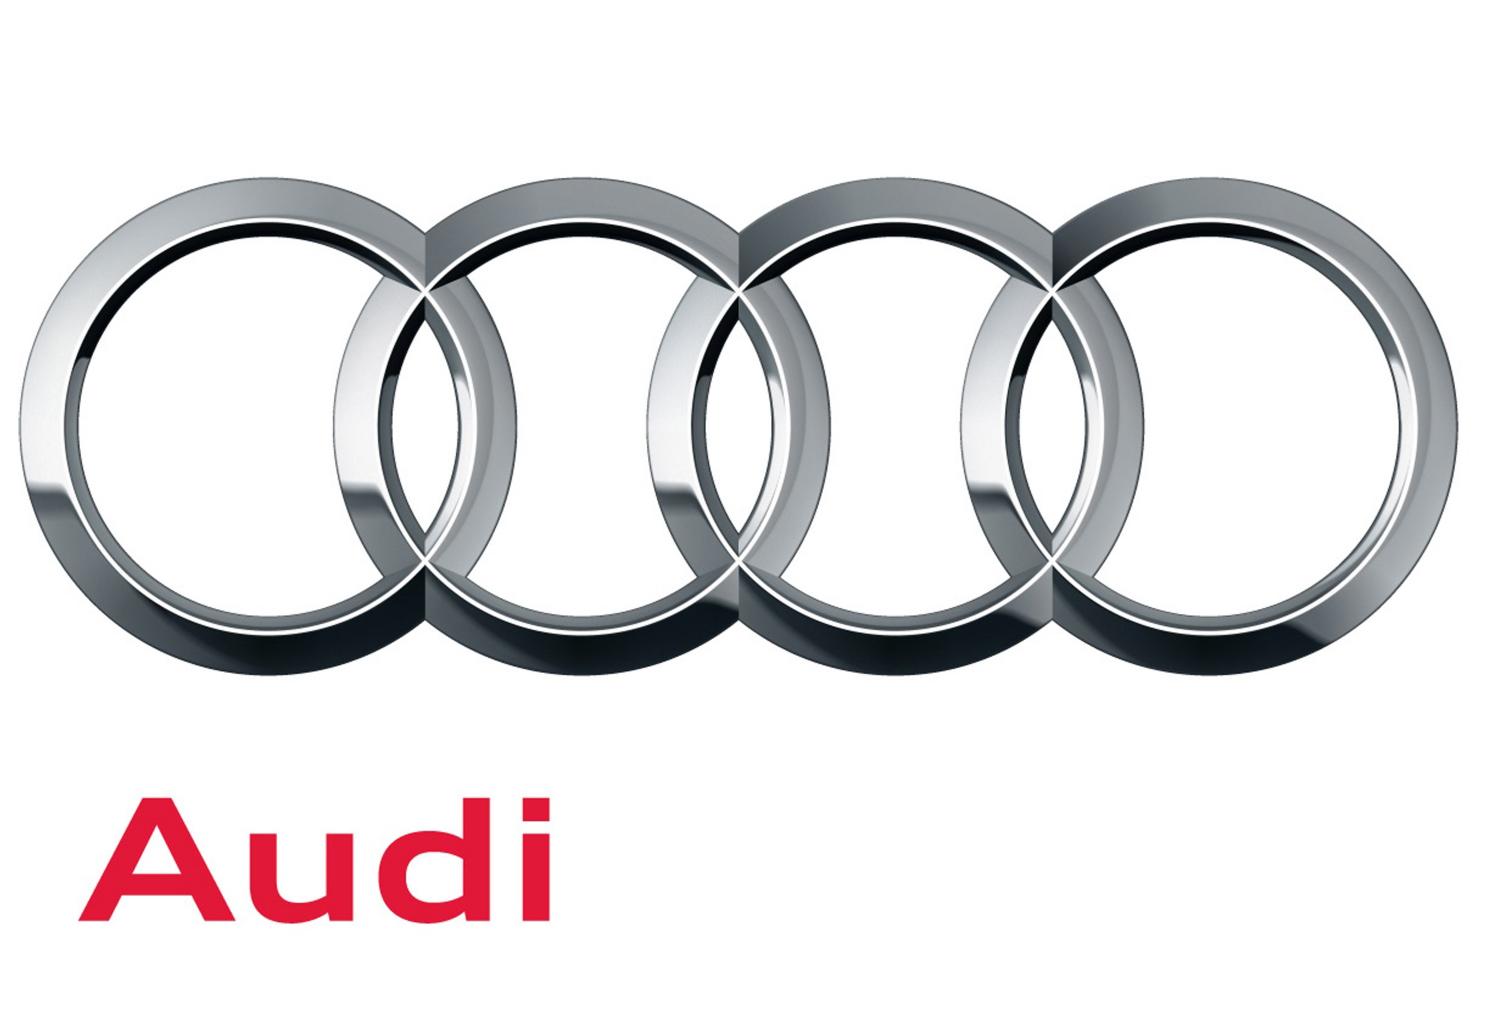 Audi Logo Png Transparent Audi Logo Png Images Pluspng